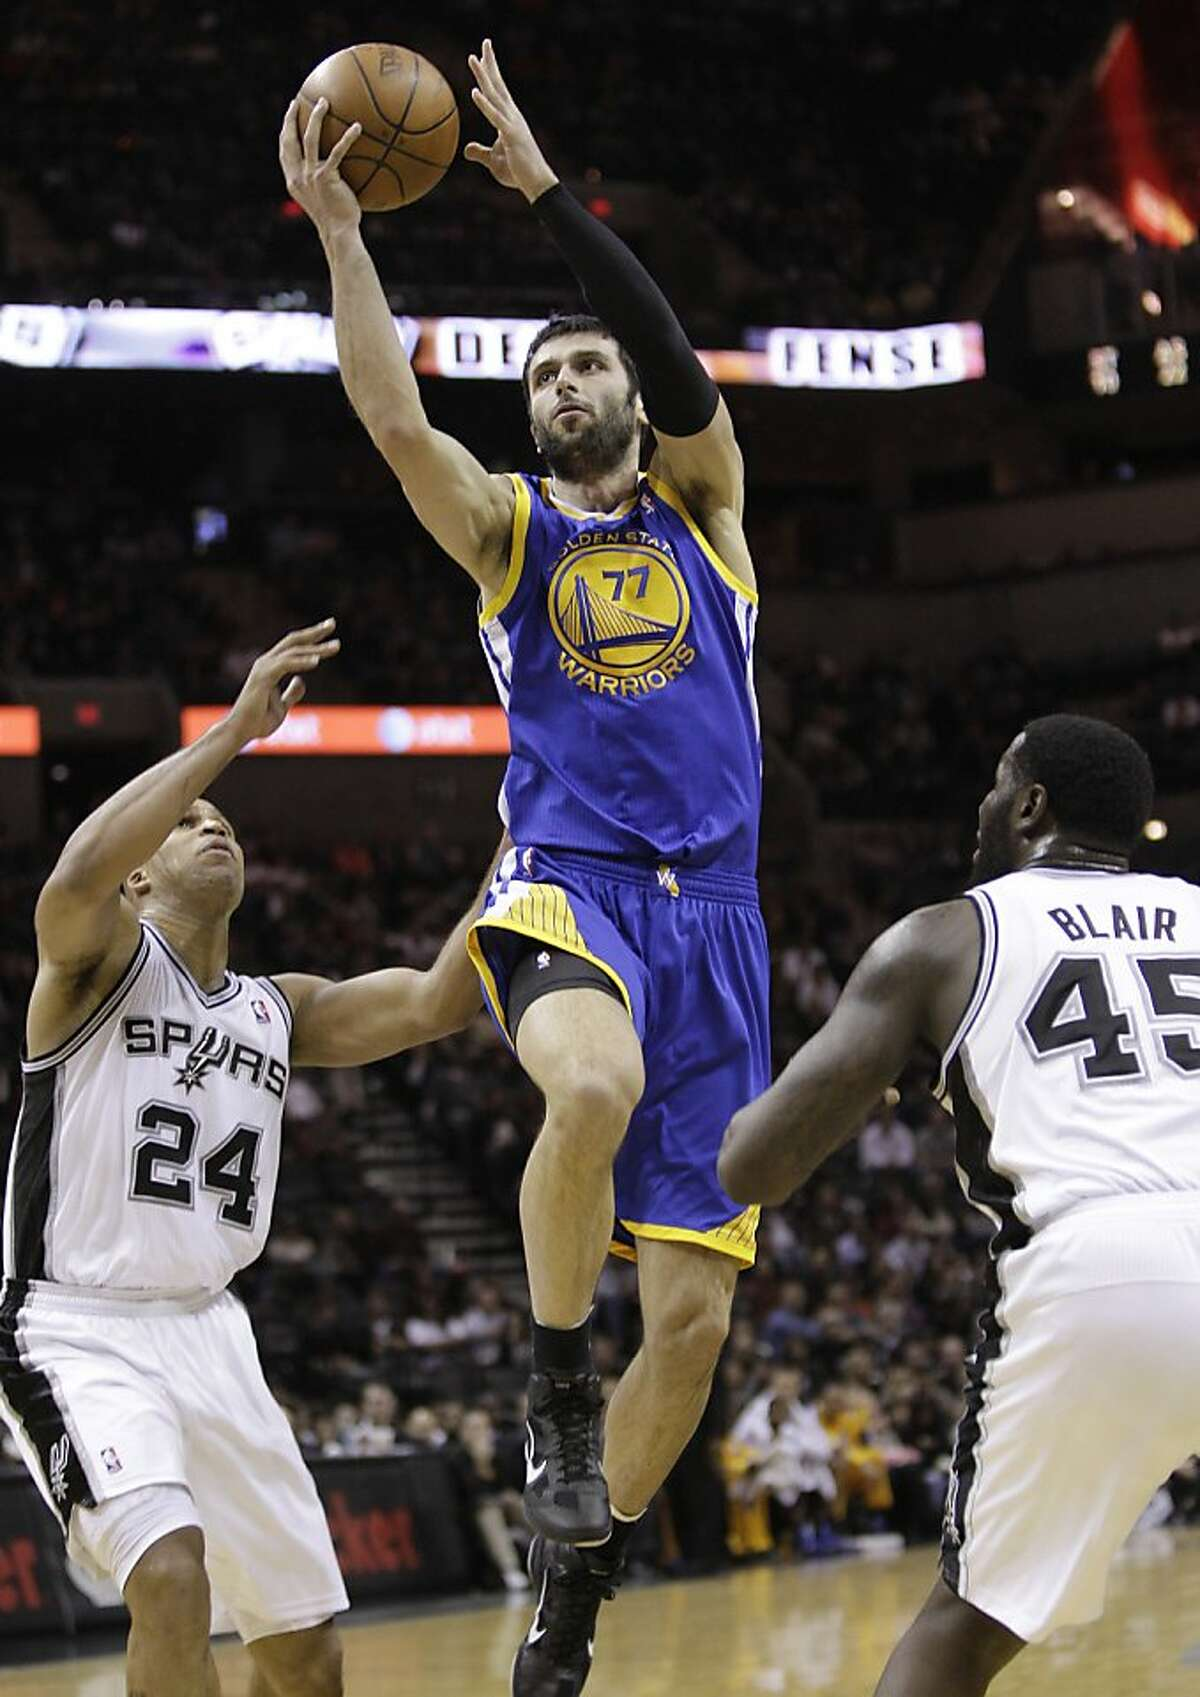 Golden State Warriors' Vladimir Radmanovic (77), of Serbia, drives between San Antonio Spurs' Richard Jefferson (24) and DeJuan Blair during the fourth quarter of an NBA basketball game, Wednesday, Dec. 8, 2010 in San Antonio. The Spurs won 111-94. (AP Photo/Eric Gay)